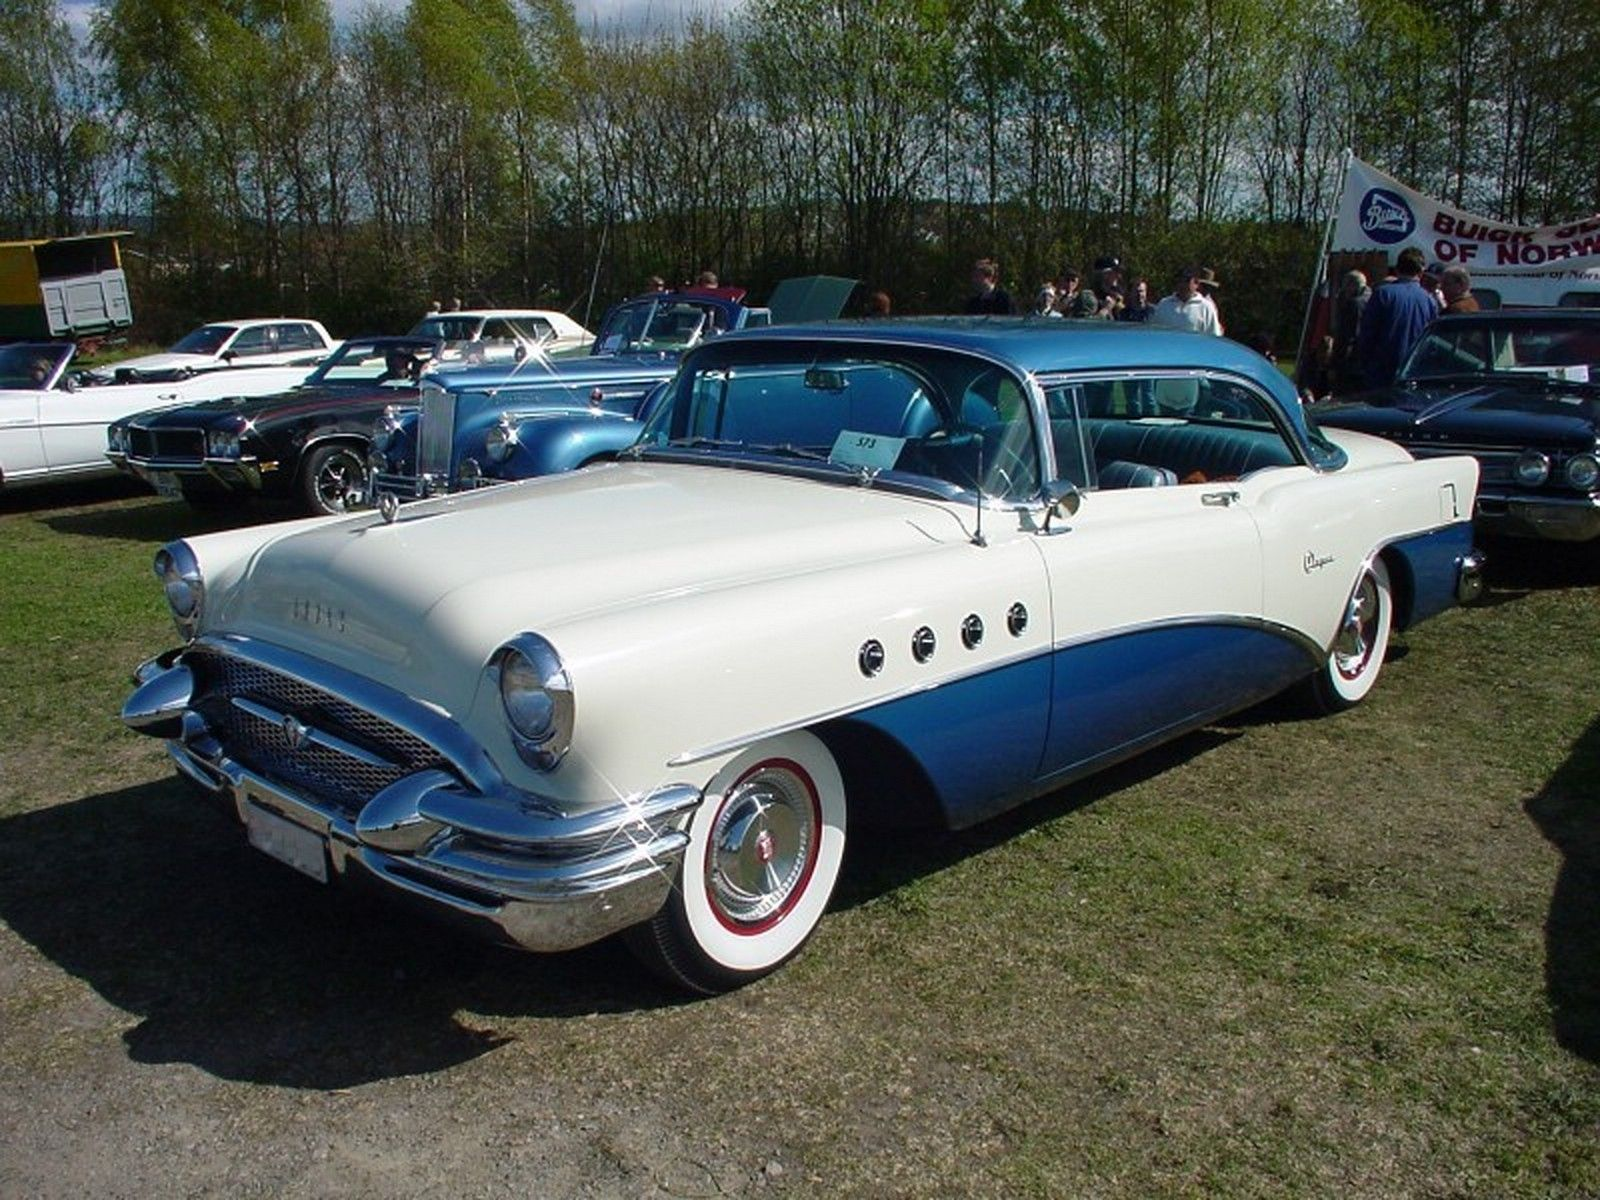 1955 Buick Roadmaster Super